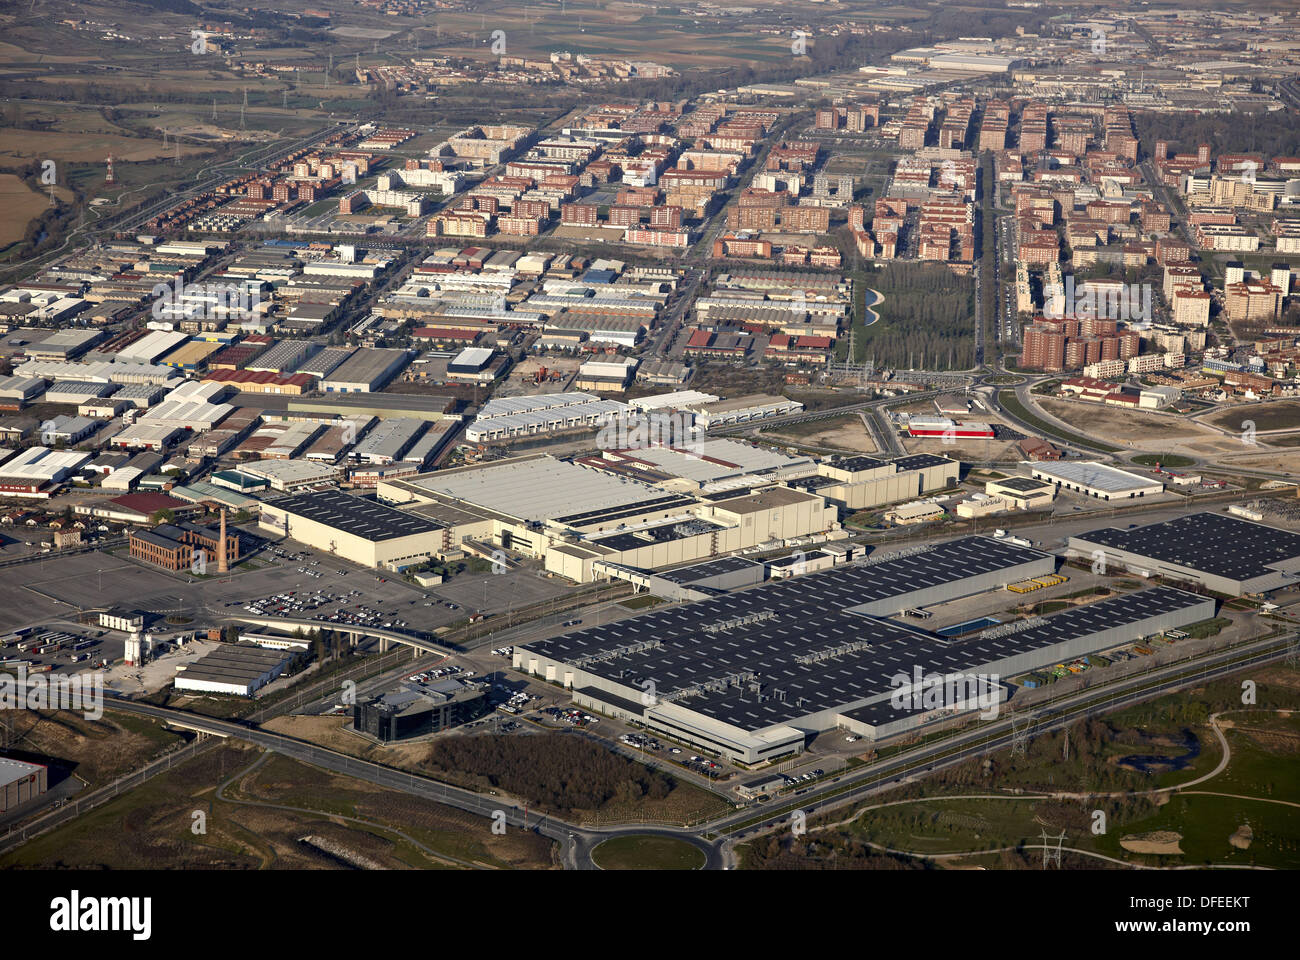 Mercedes-Benz van factory, Poligono Industrial Jundiz, Vitoria (Gasteiz), Araba, Basque Country, Spain - Stock Image